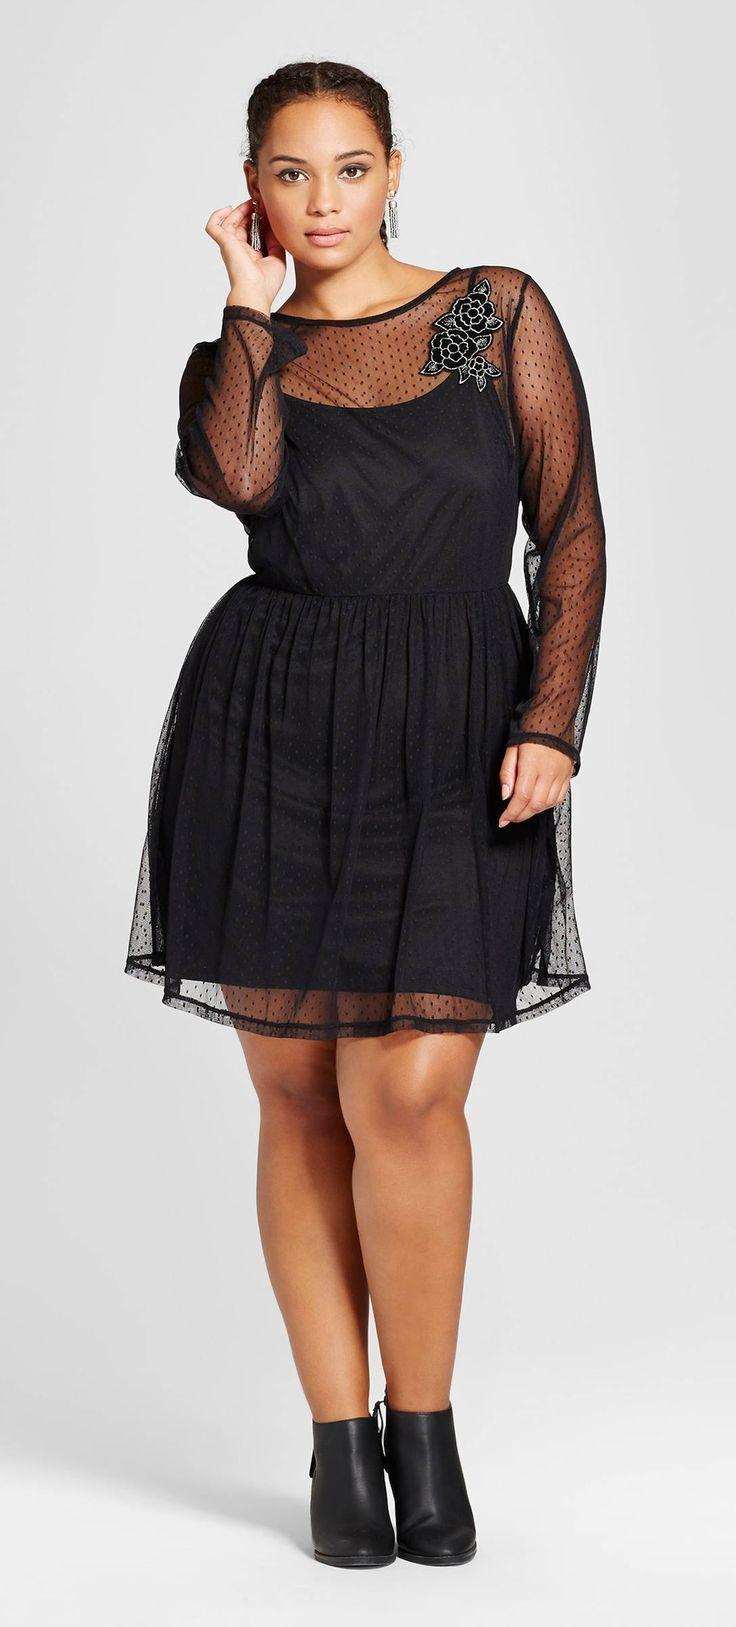 Plus Size Floral Embroidered Mesh Dress Plus Size Fashion